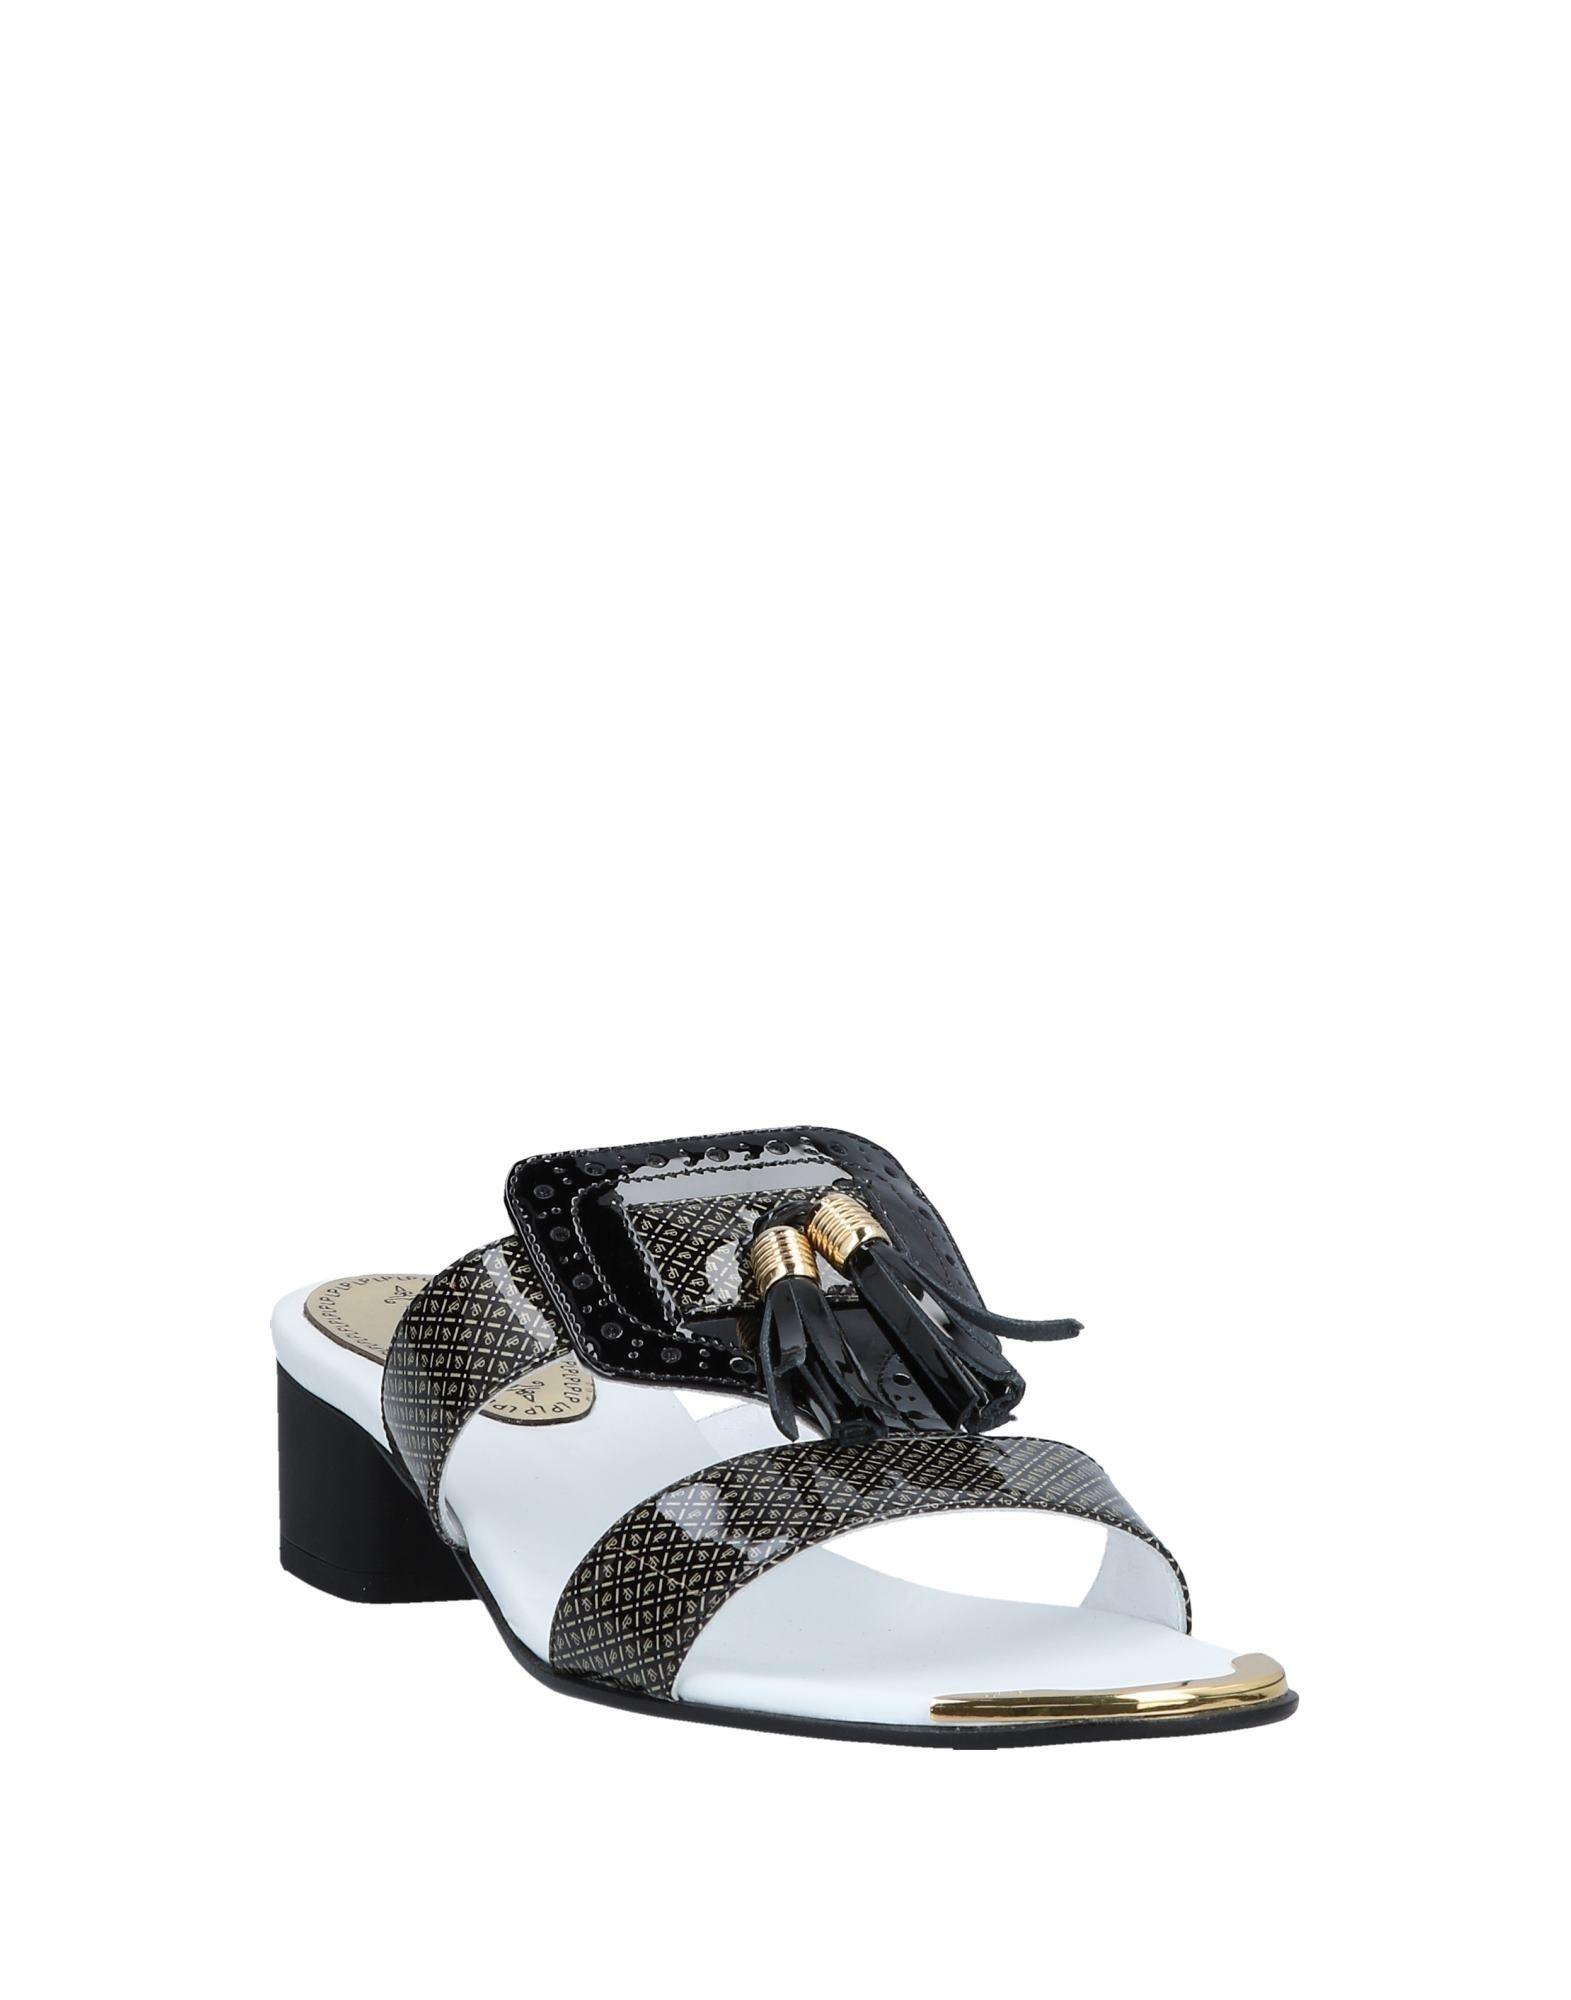 Loretta Pettinari Pettinari Pettinari Sandals - Women Loretta Pettinari Sandals online on  Canada - 11565361DE 180f79